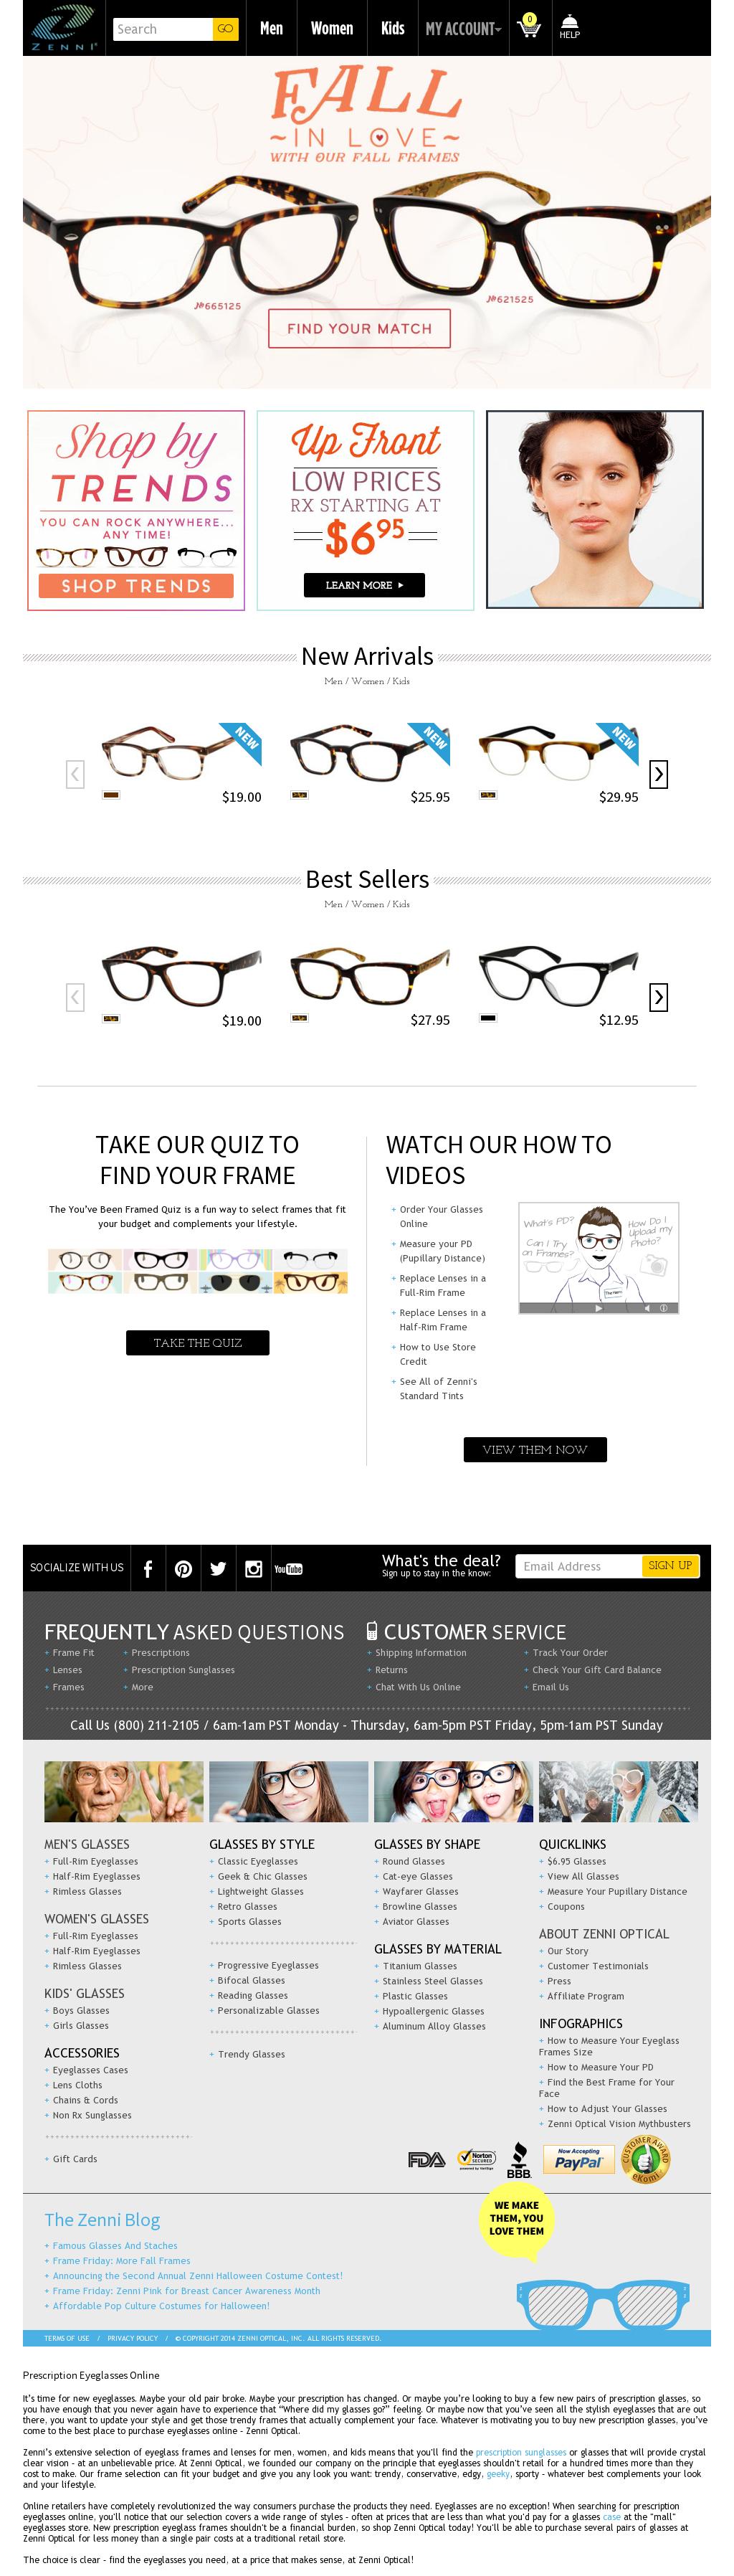 websites like zenni optical